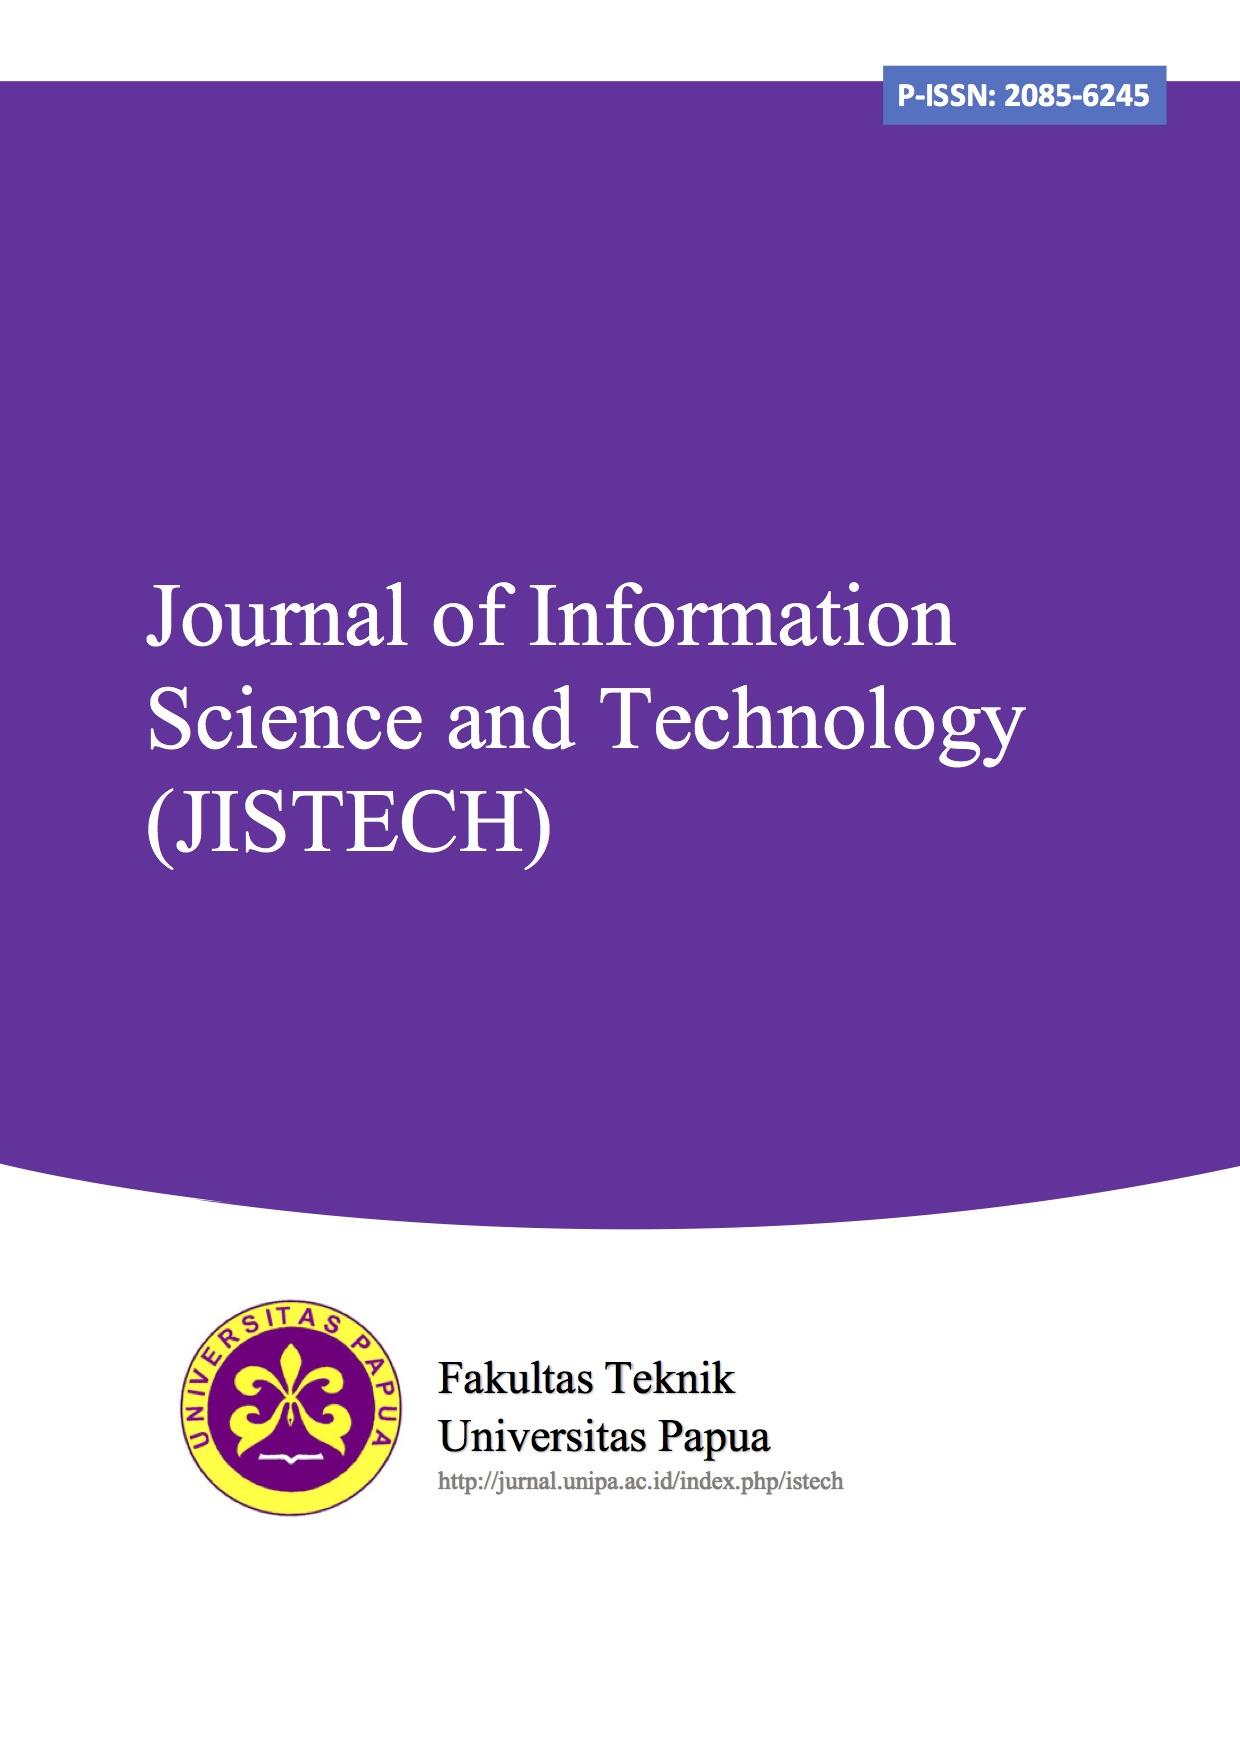 Journal of Information Science Technology (JISTECH)